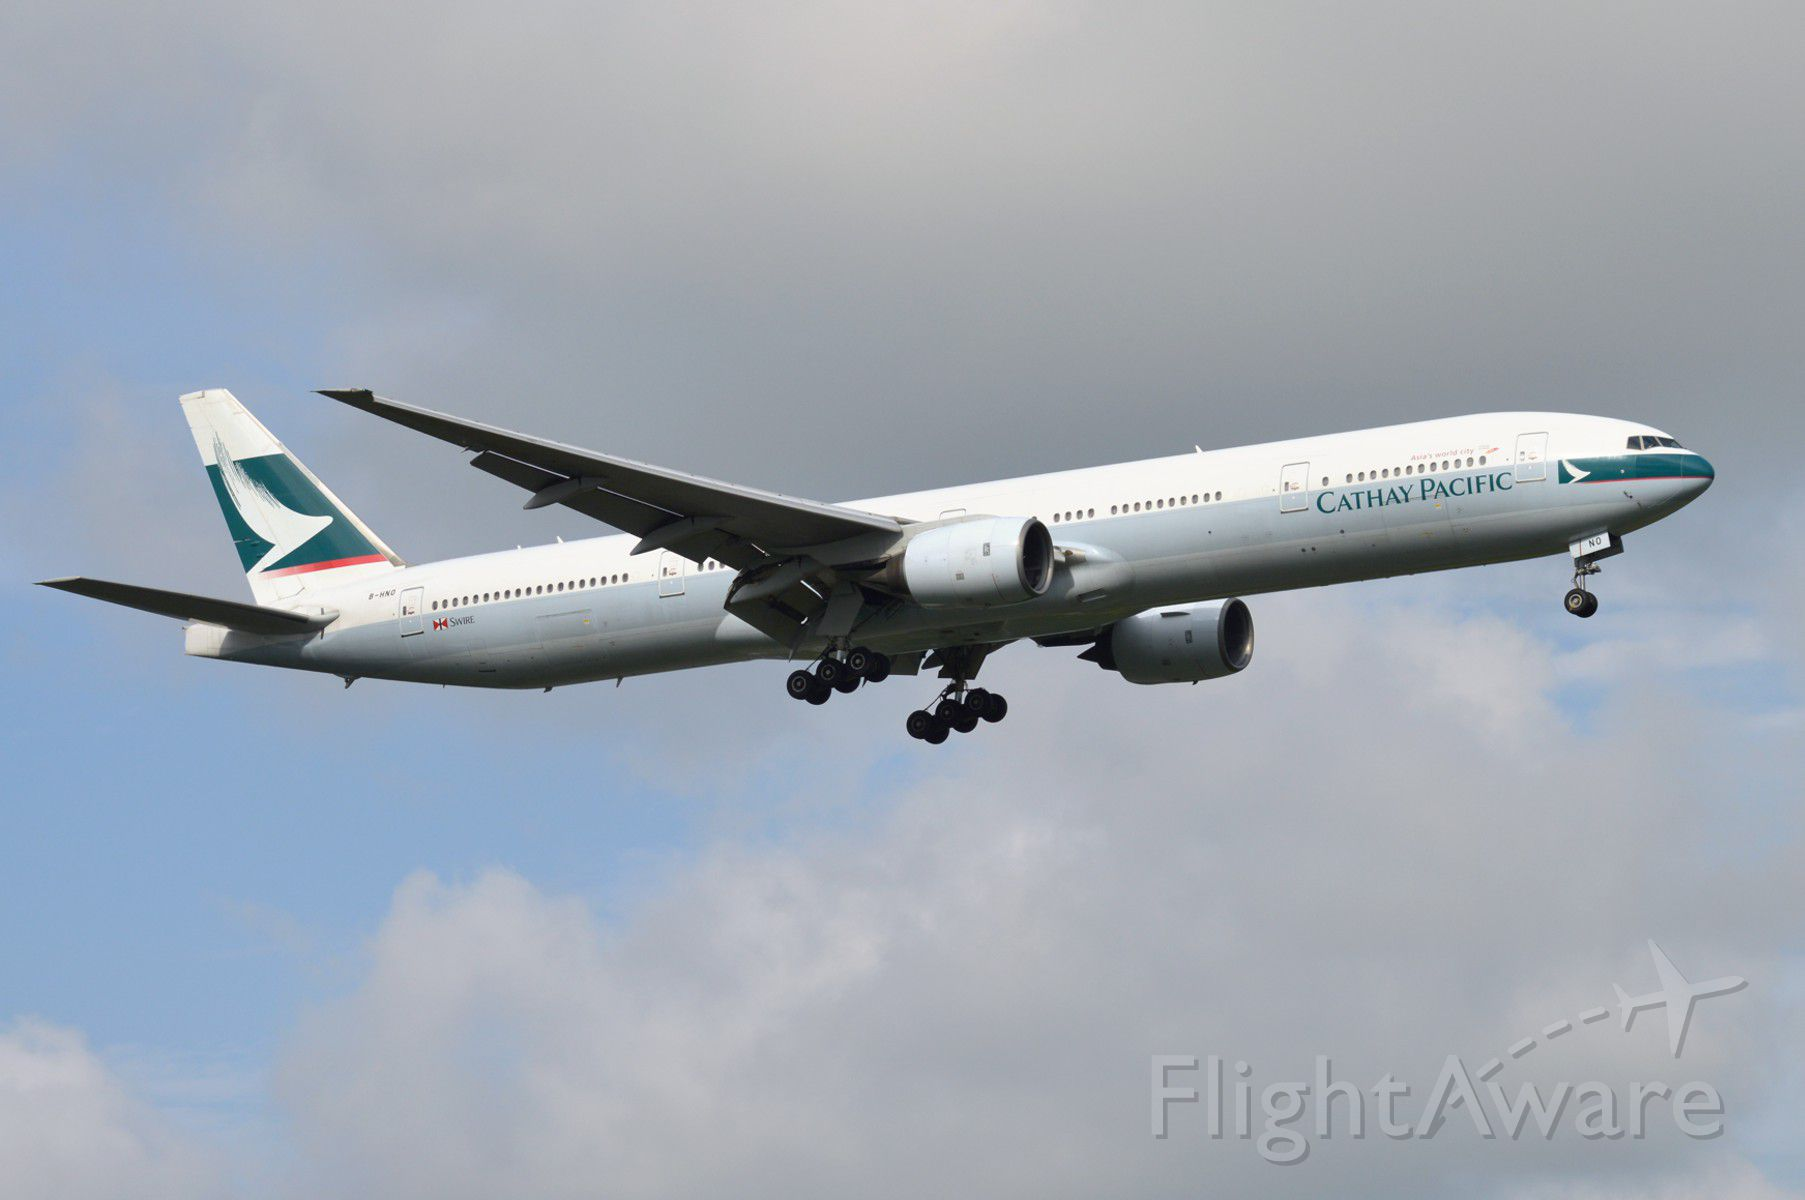 BOEING 777-300 (B-HNO) - 2014-08-17